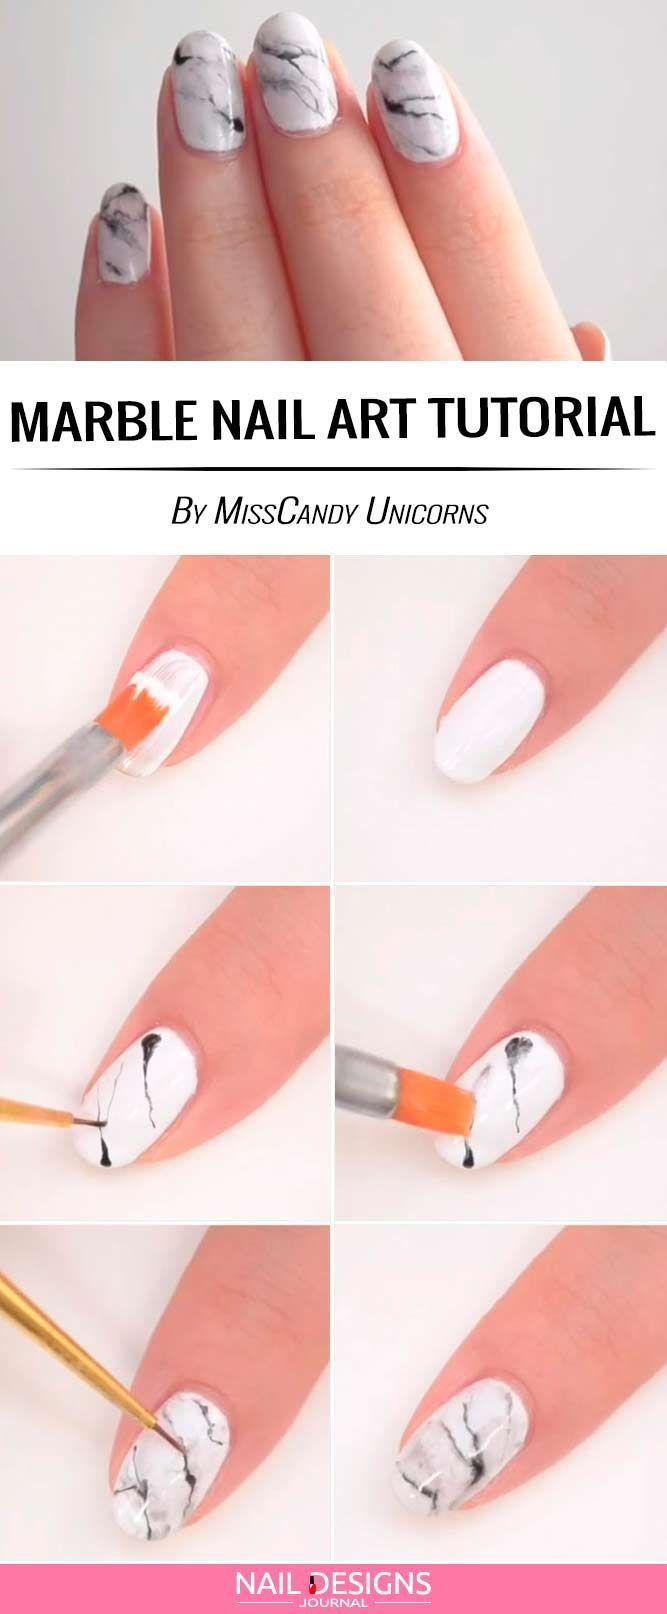 20 Super Easy Nail Designs Diy Tutorials Diy Nail